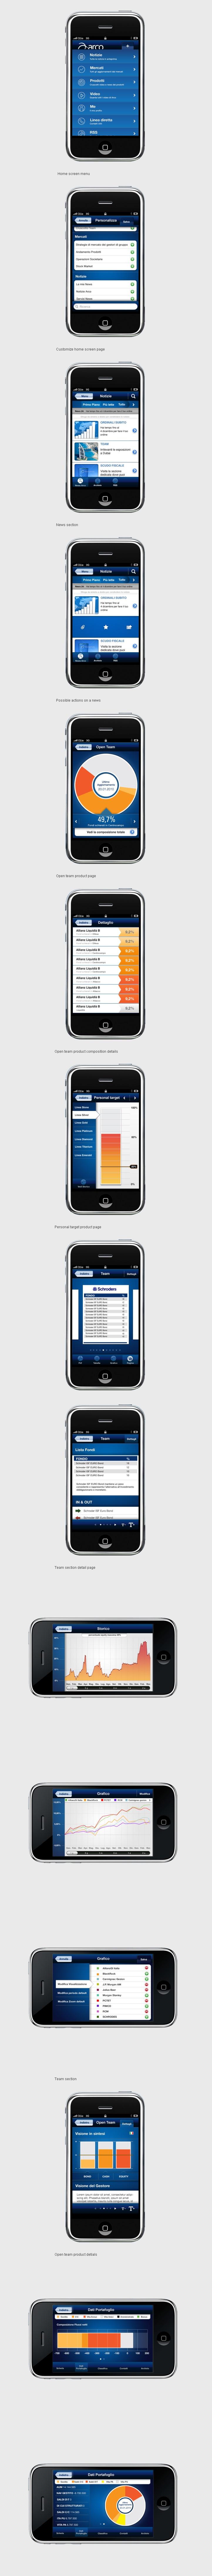 Allianz Bank Financial Advisor iPhone app by Gianpaolo Tucci via Behance